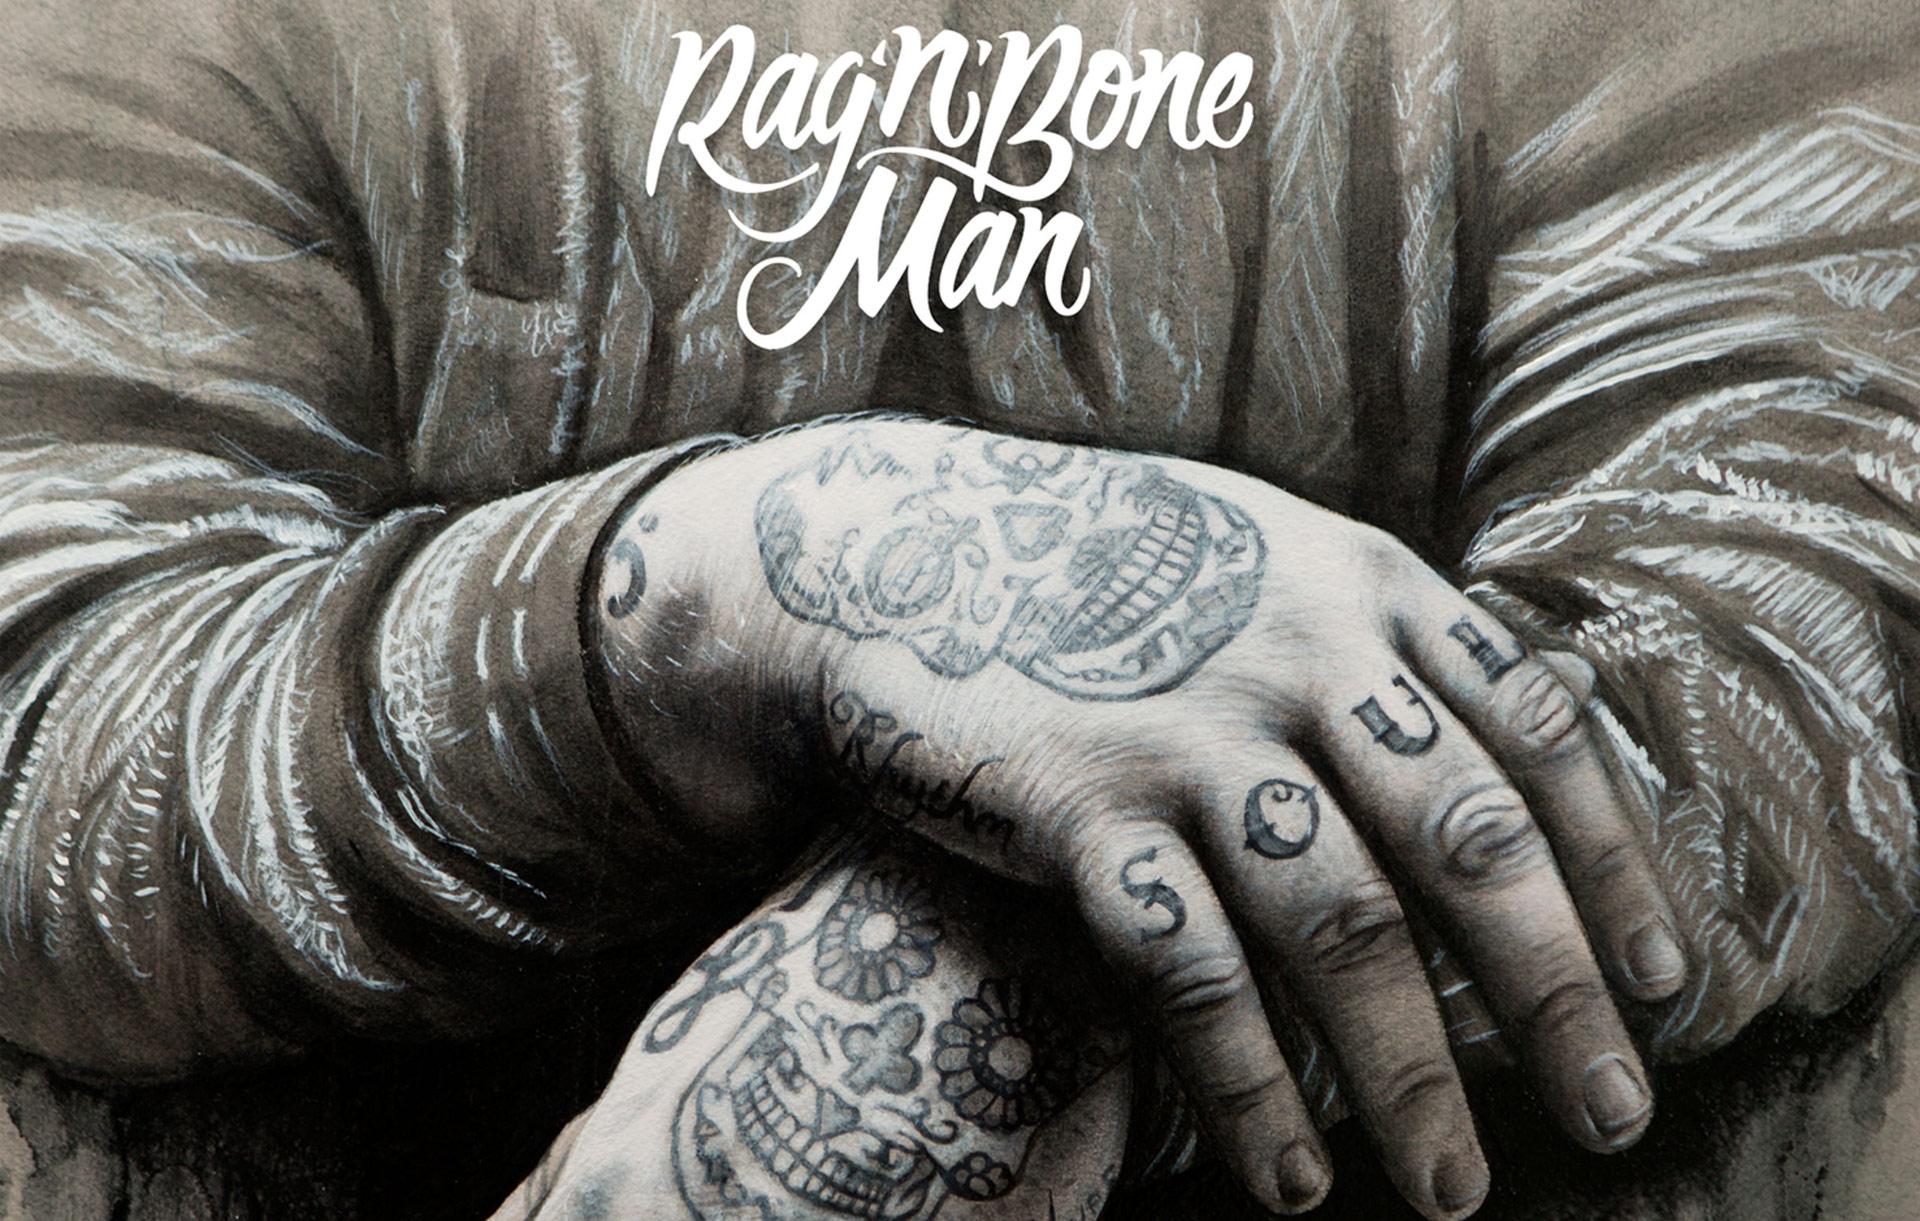 ragnbone-man